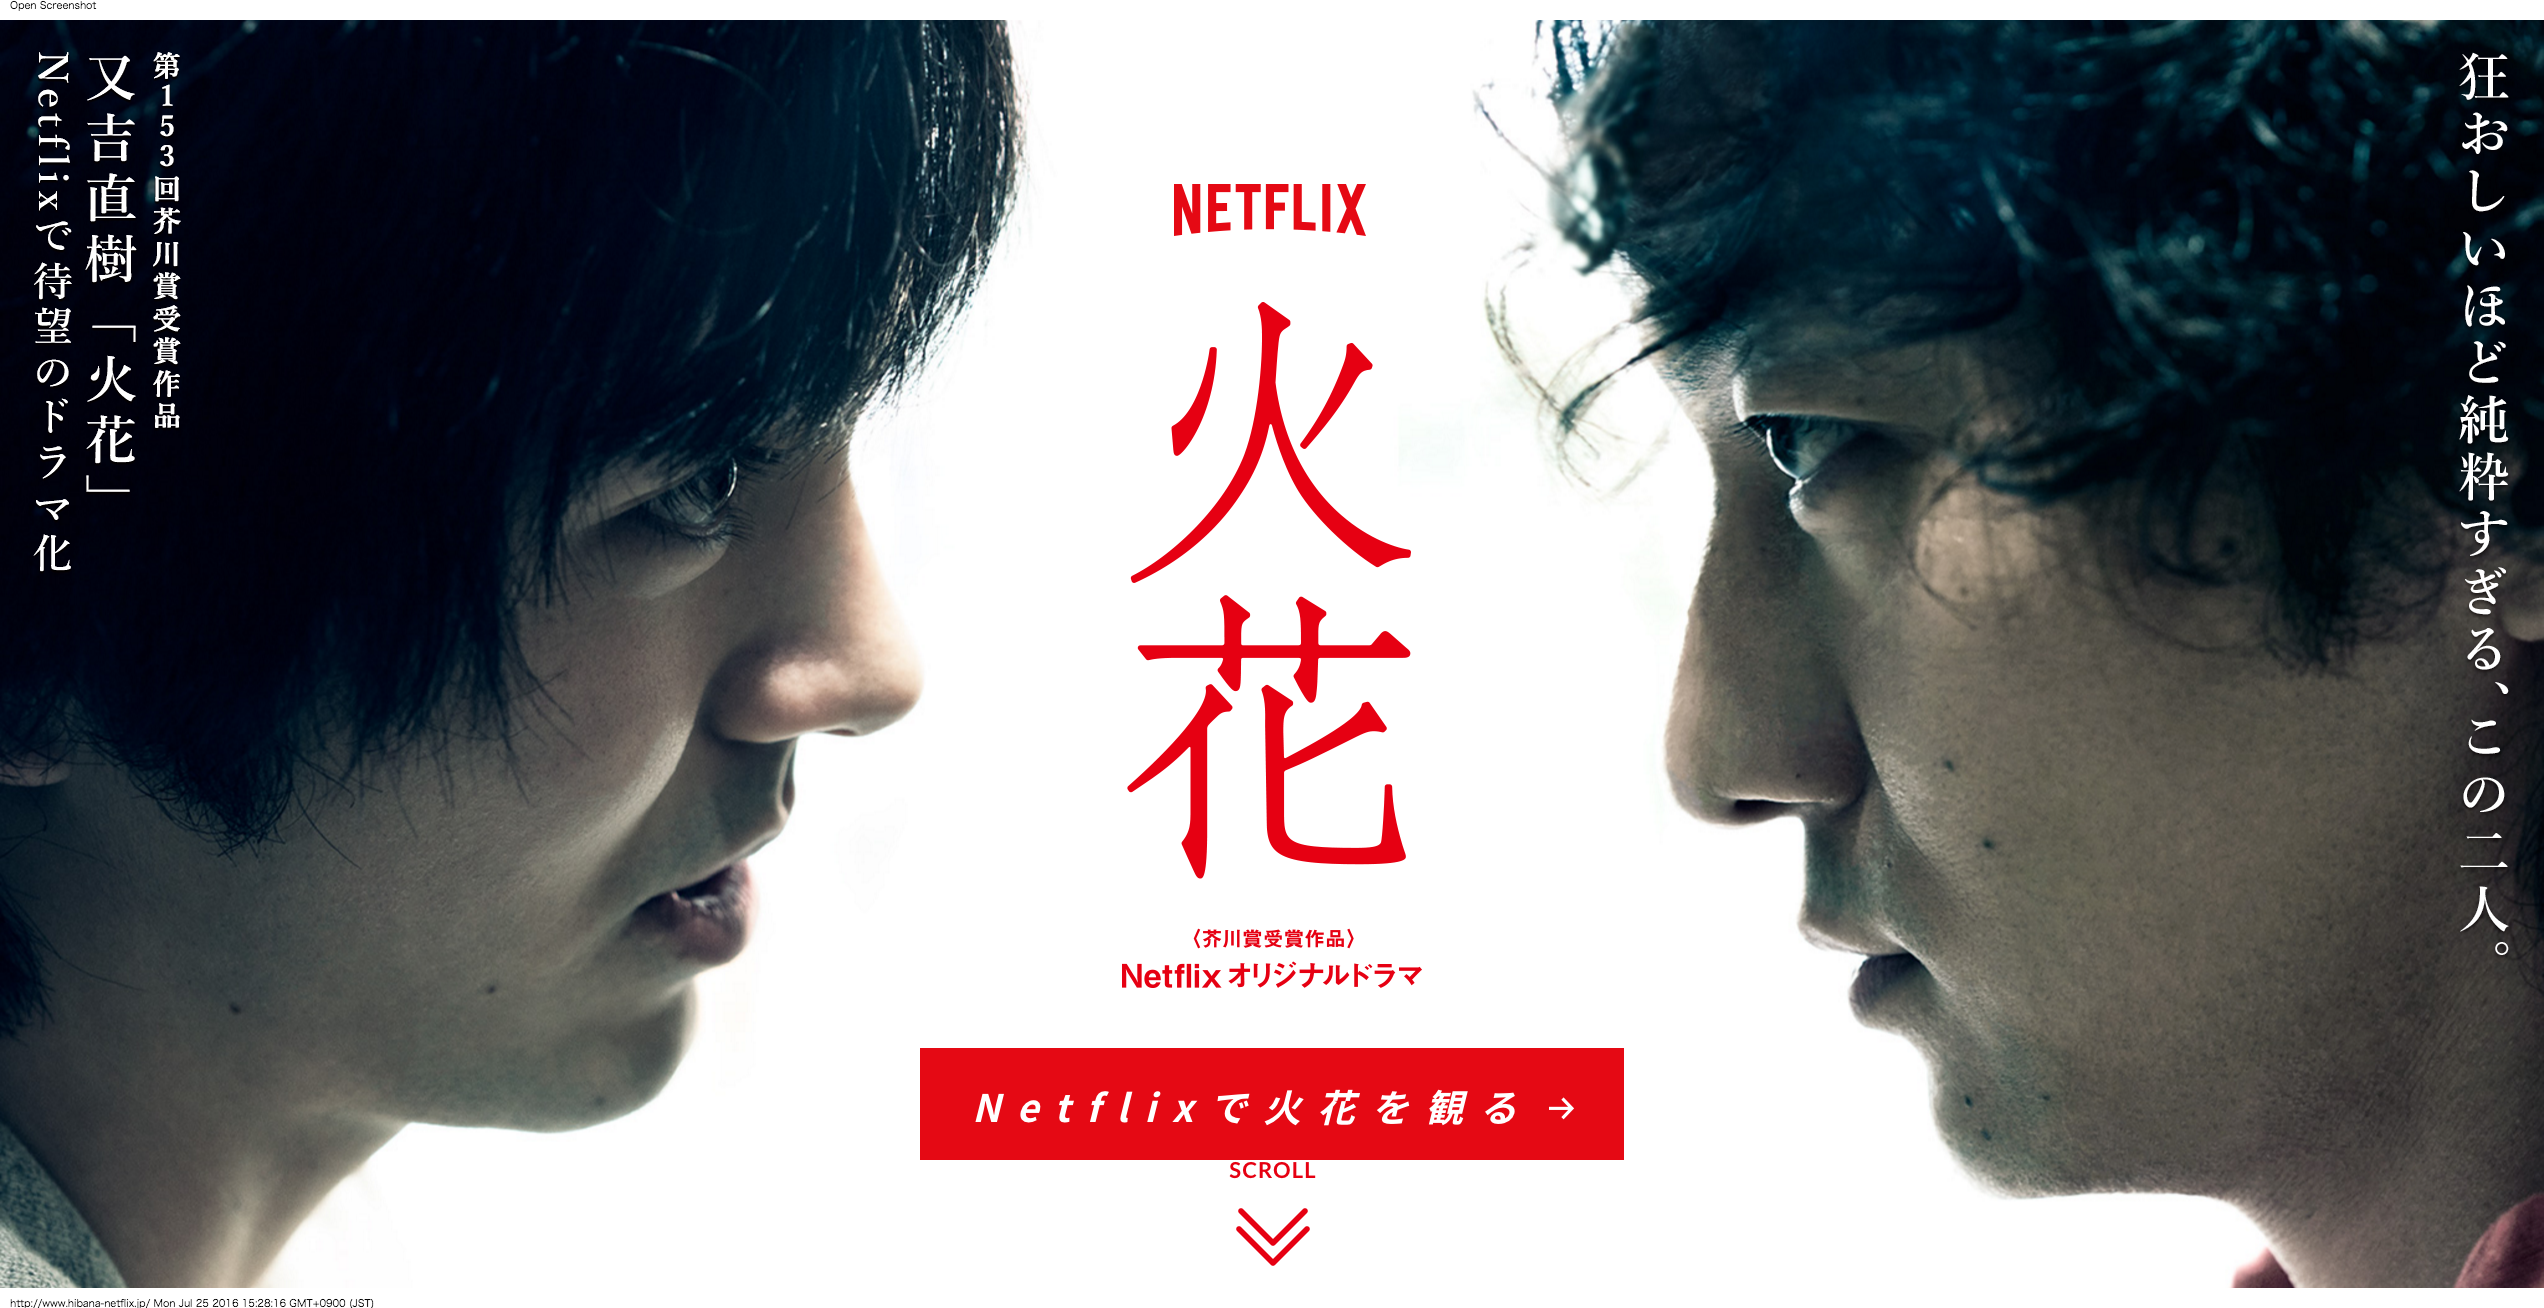 Netflixオリジナルドラマ『火花』公式サイト |  ■モリサワTypeSquare リュウミンB-KL